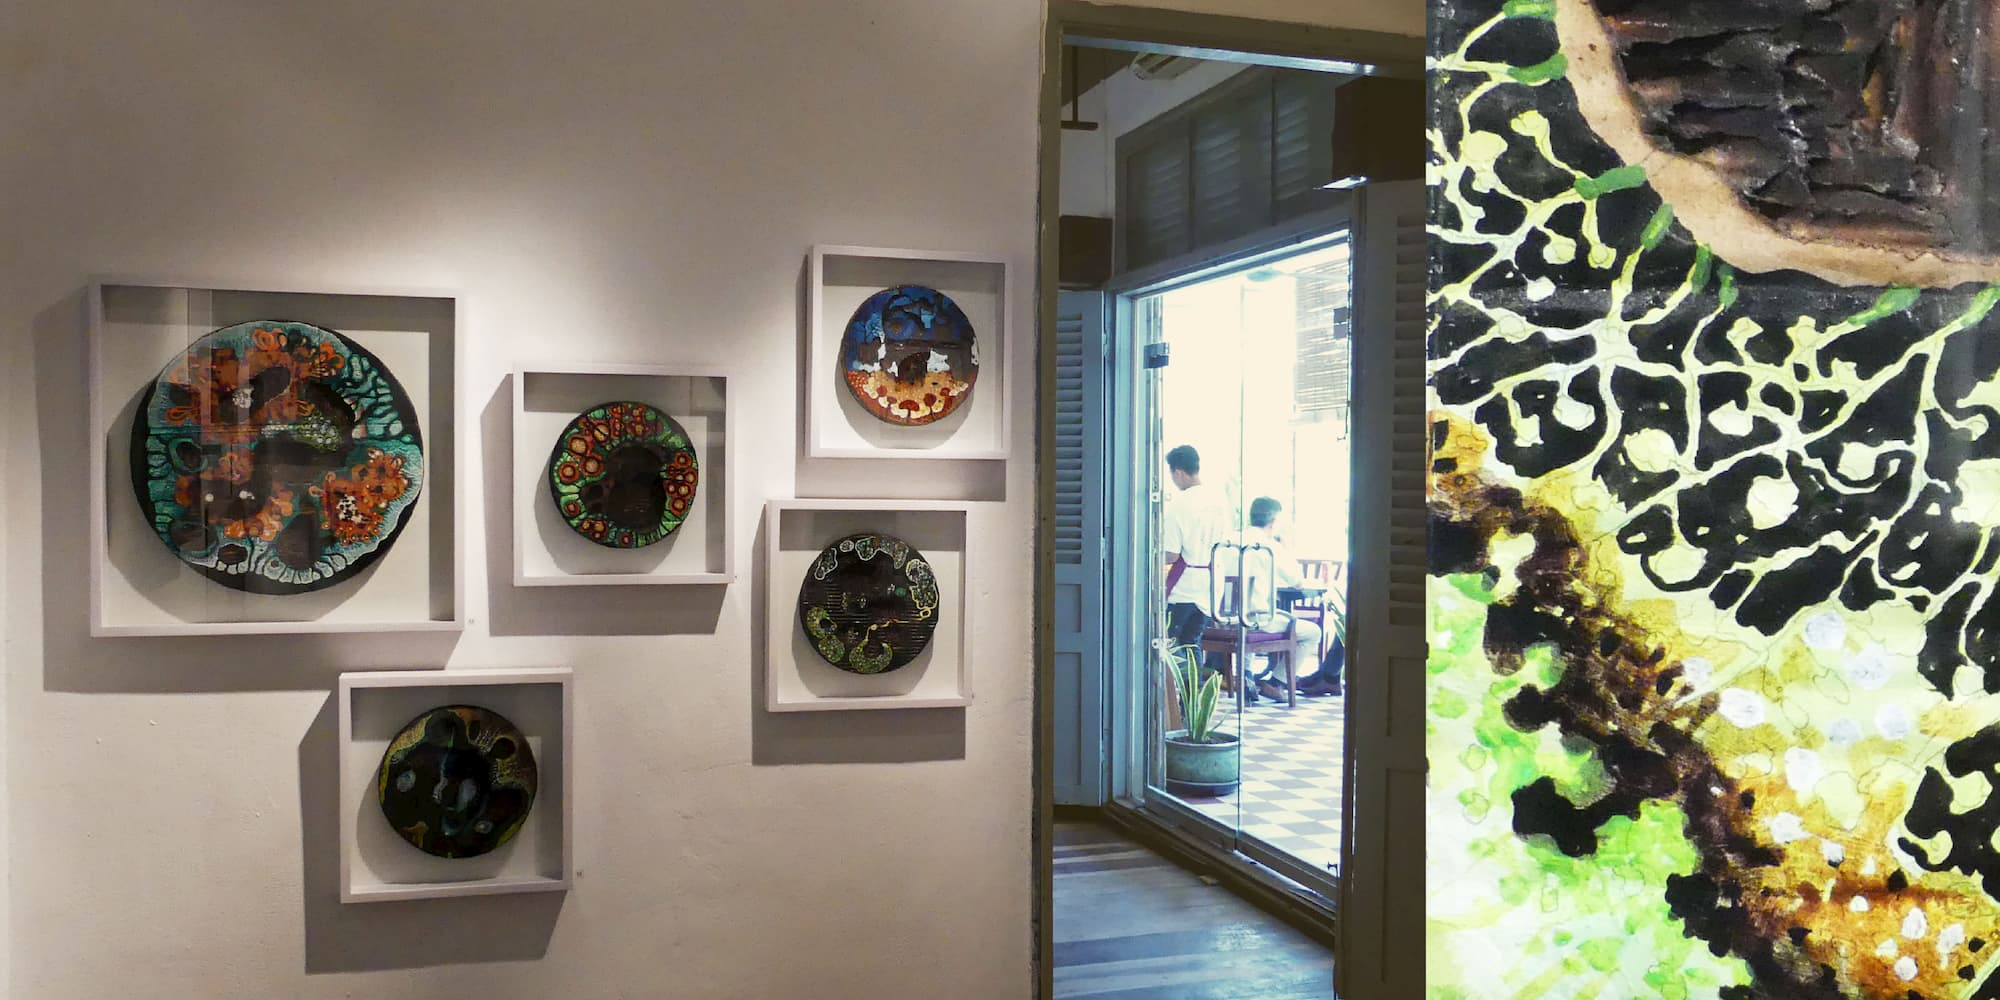 exhibition of contemporary art